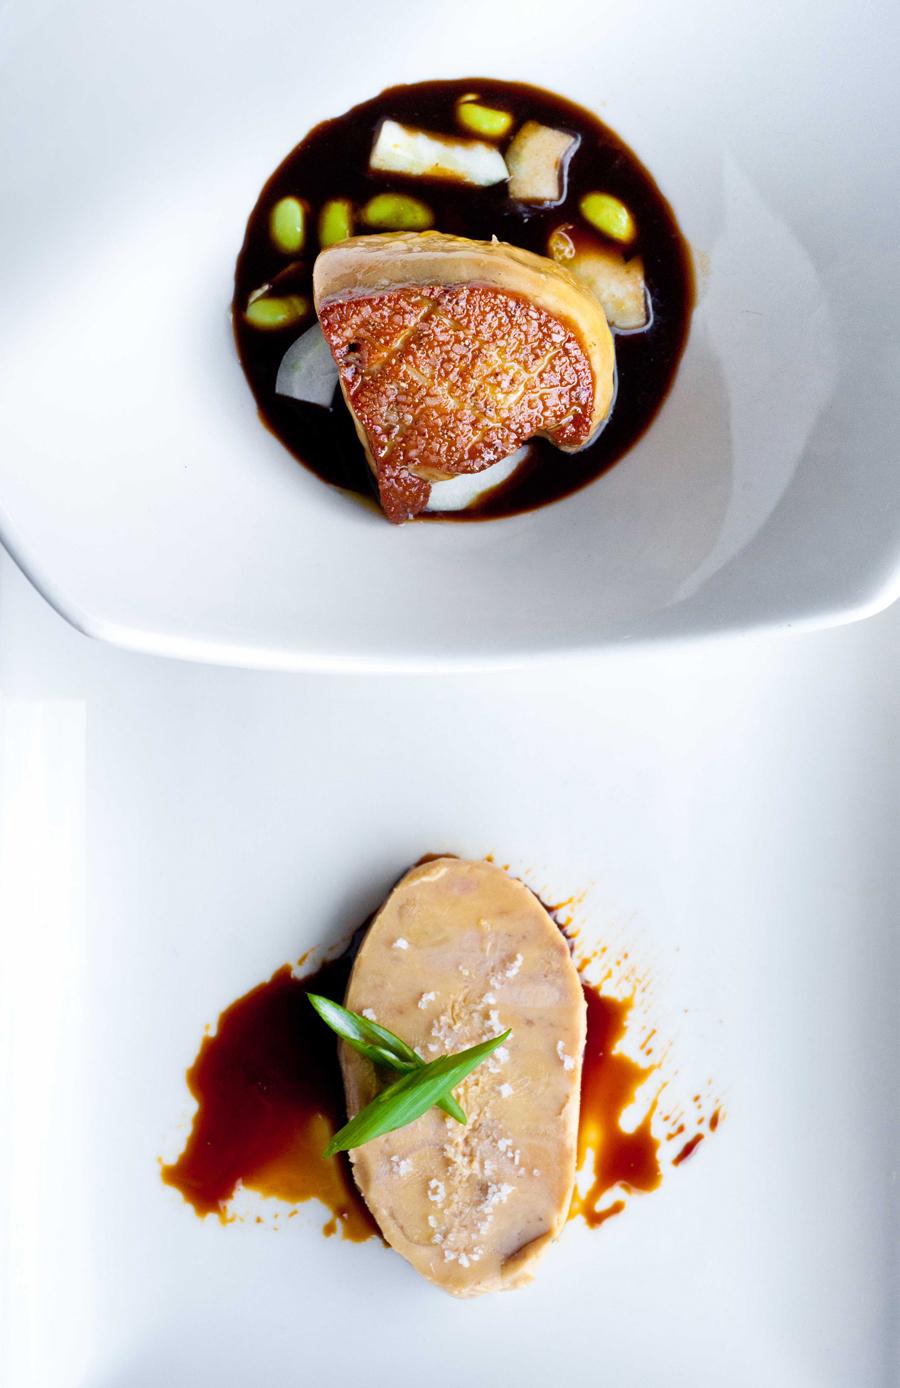 Duo of foie gras with ponzu and edamame